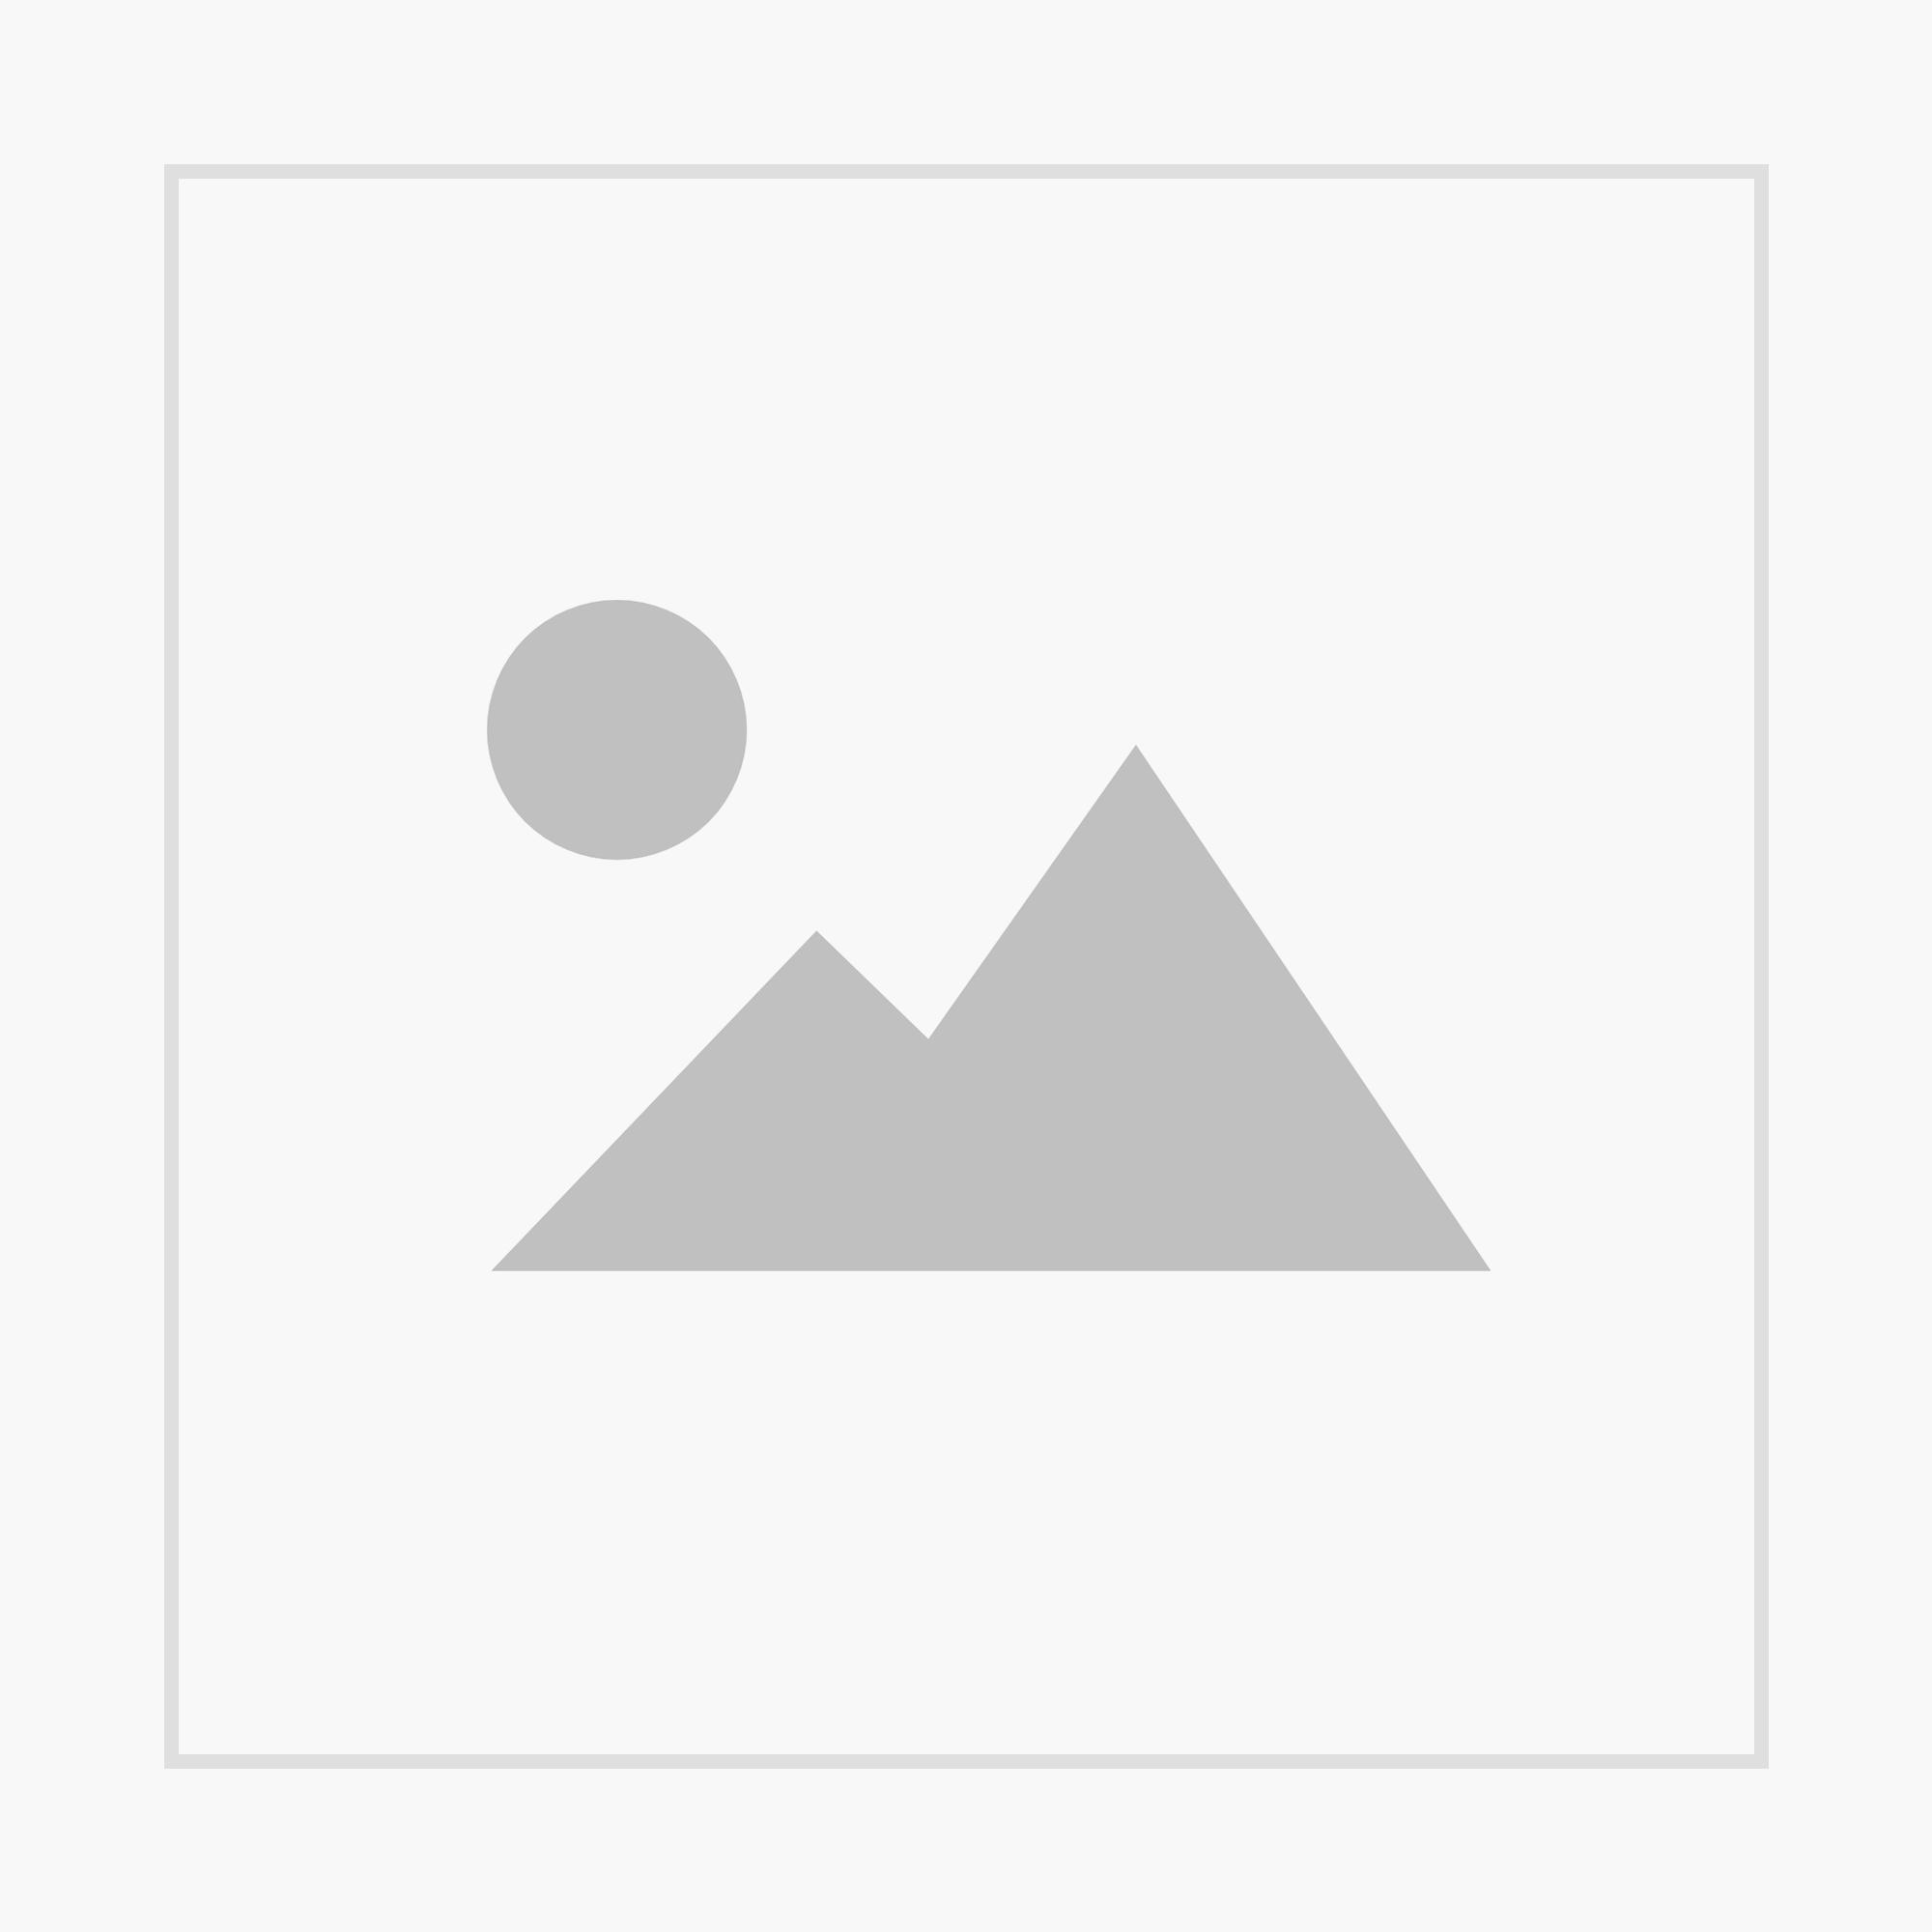 Hühnersignale